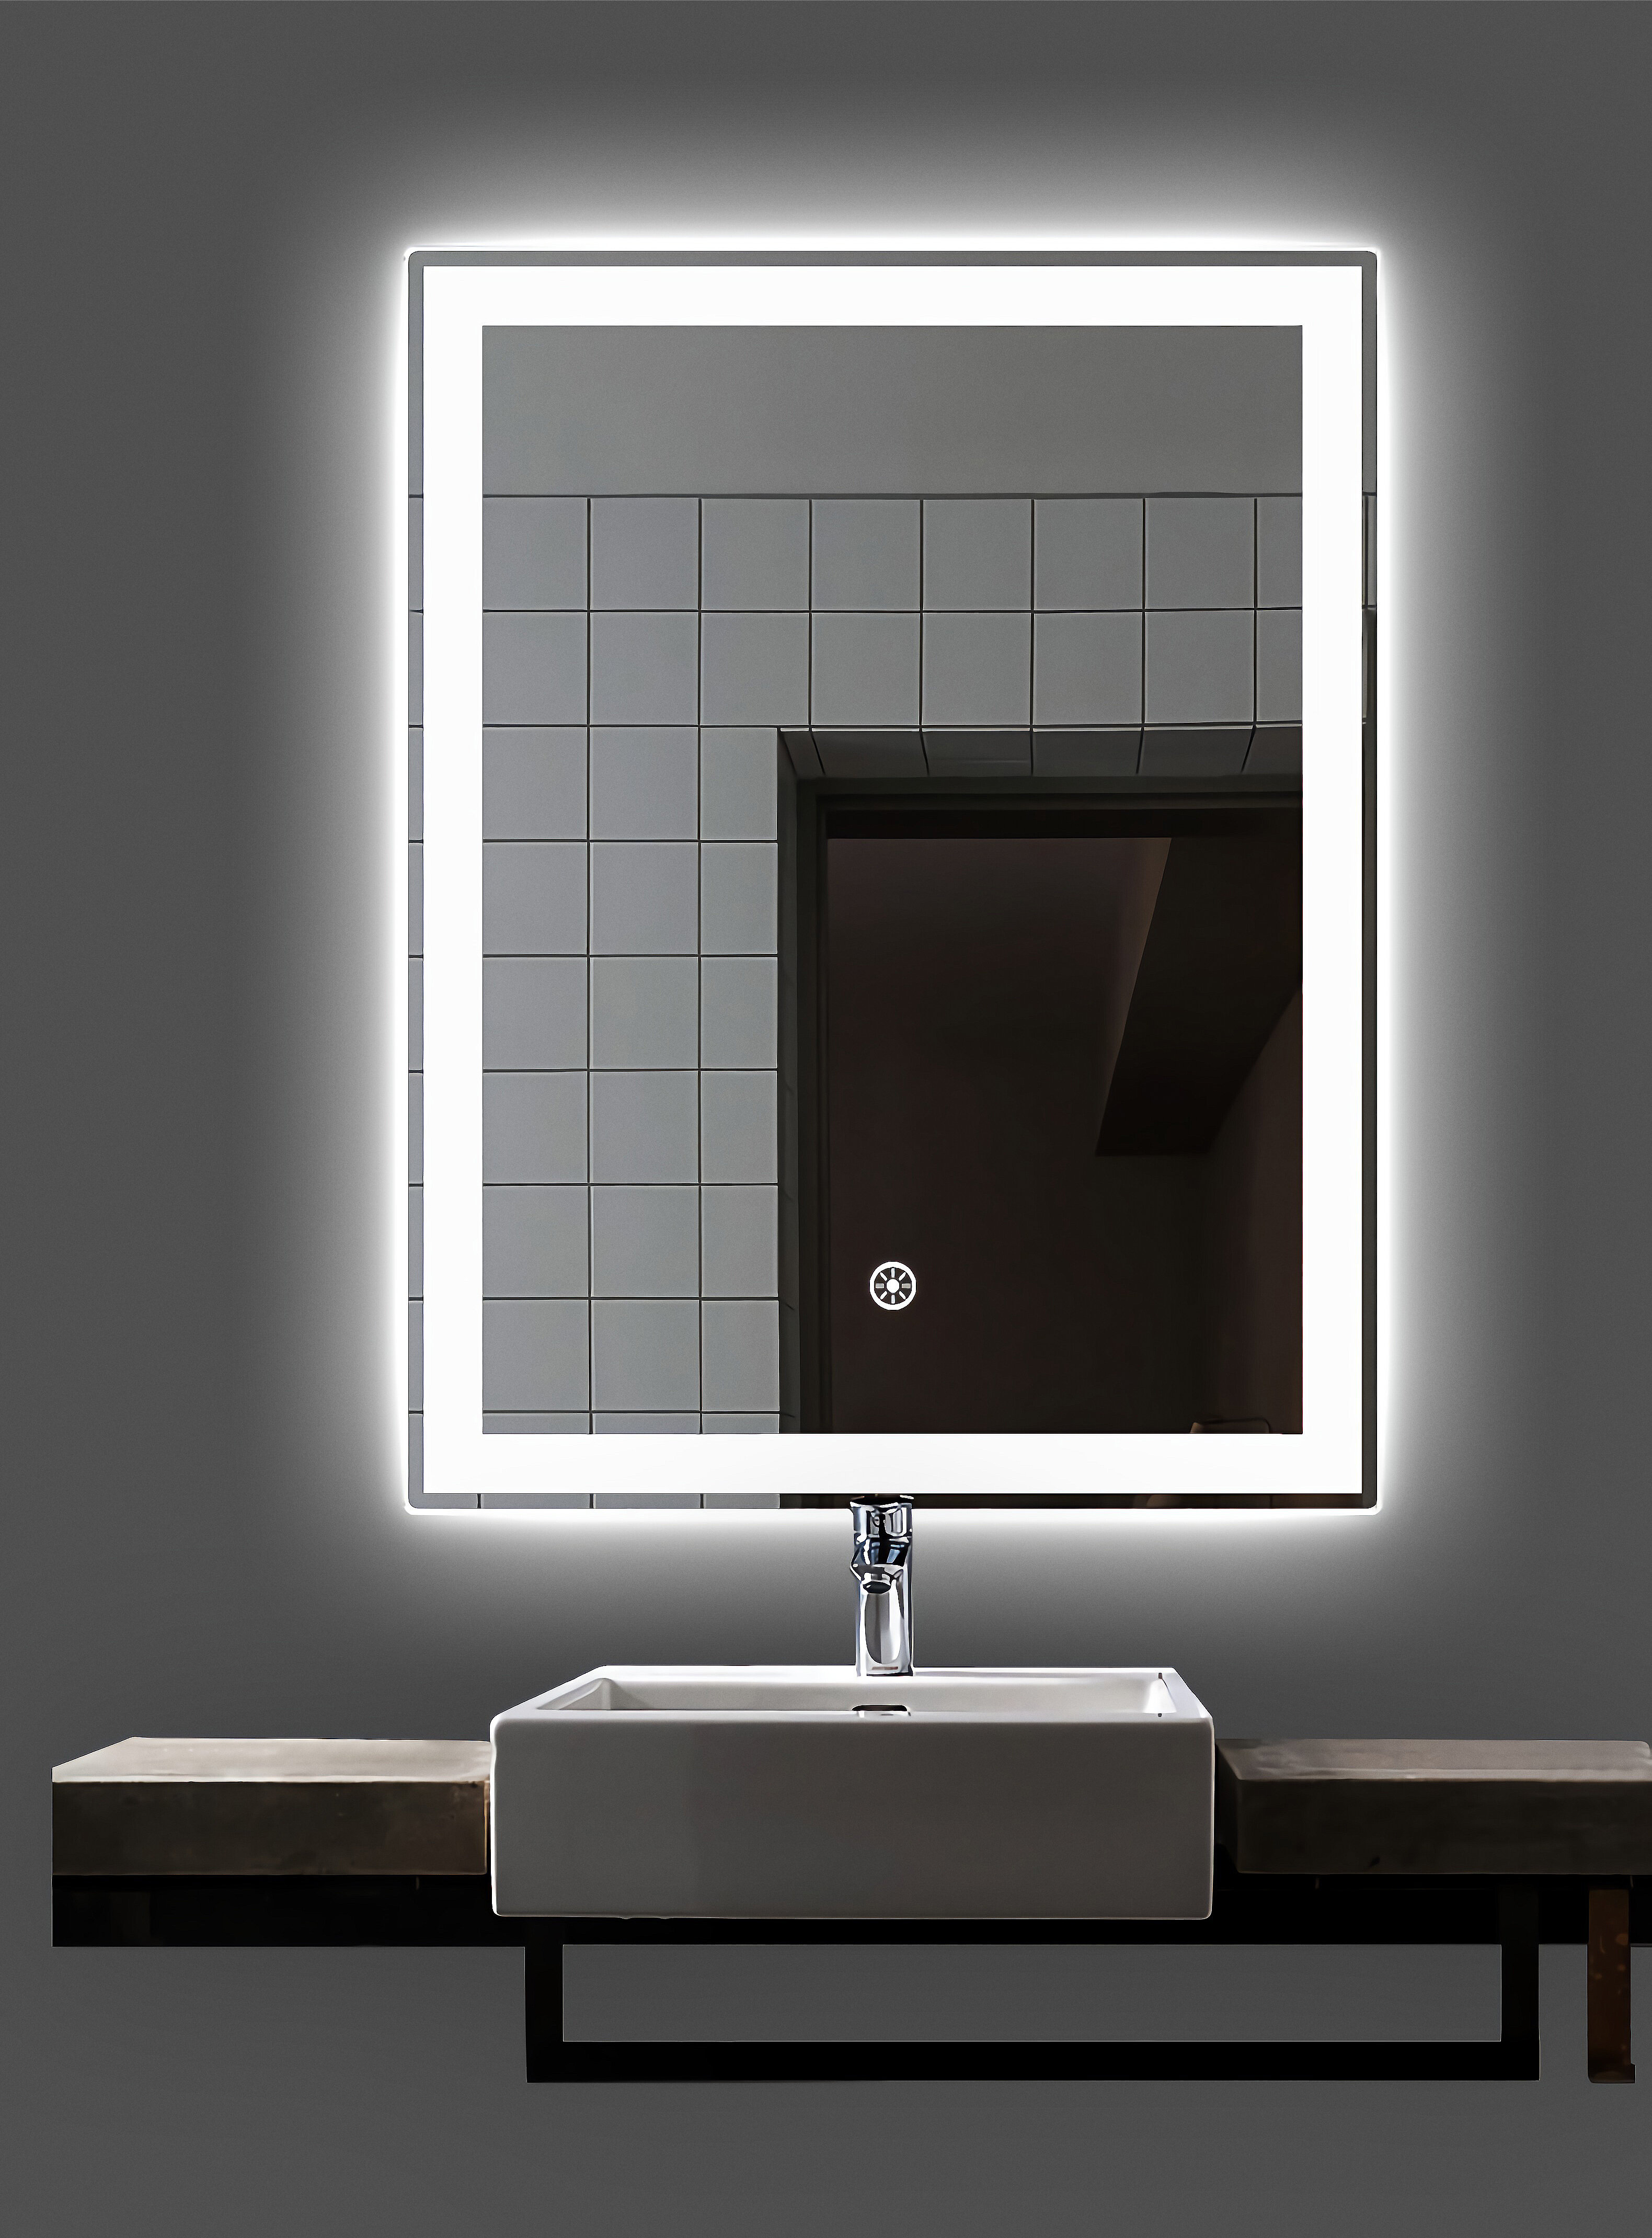 Orren Ellis Clybourn Frameless Lighted Bathroom Vanity Mirror Reviews Wayfair